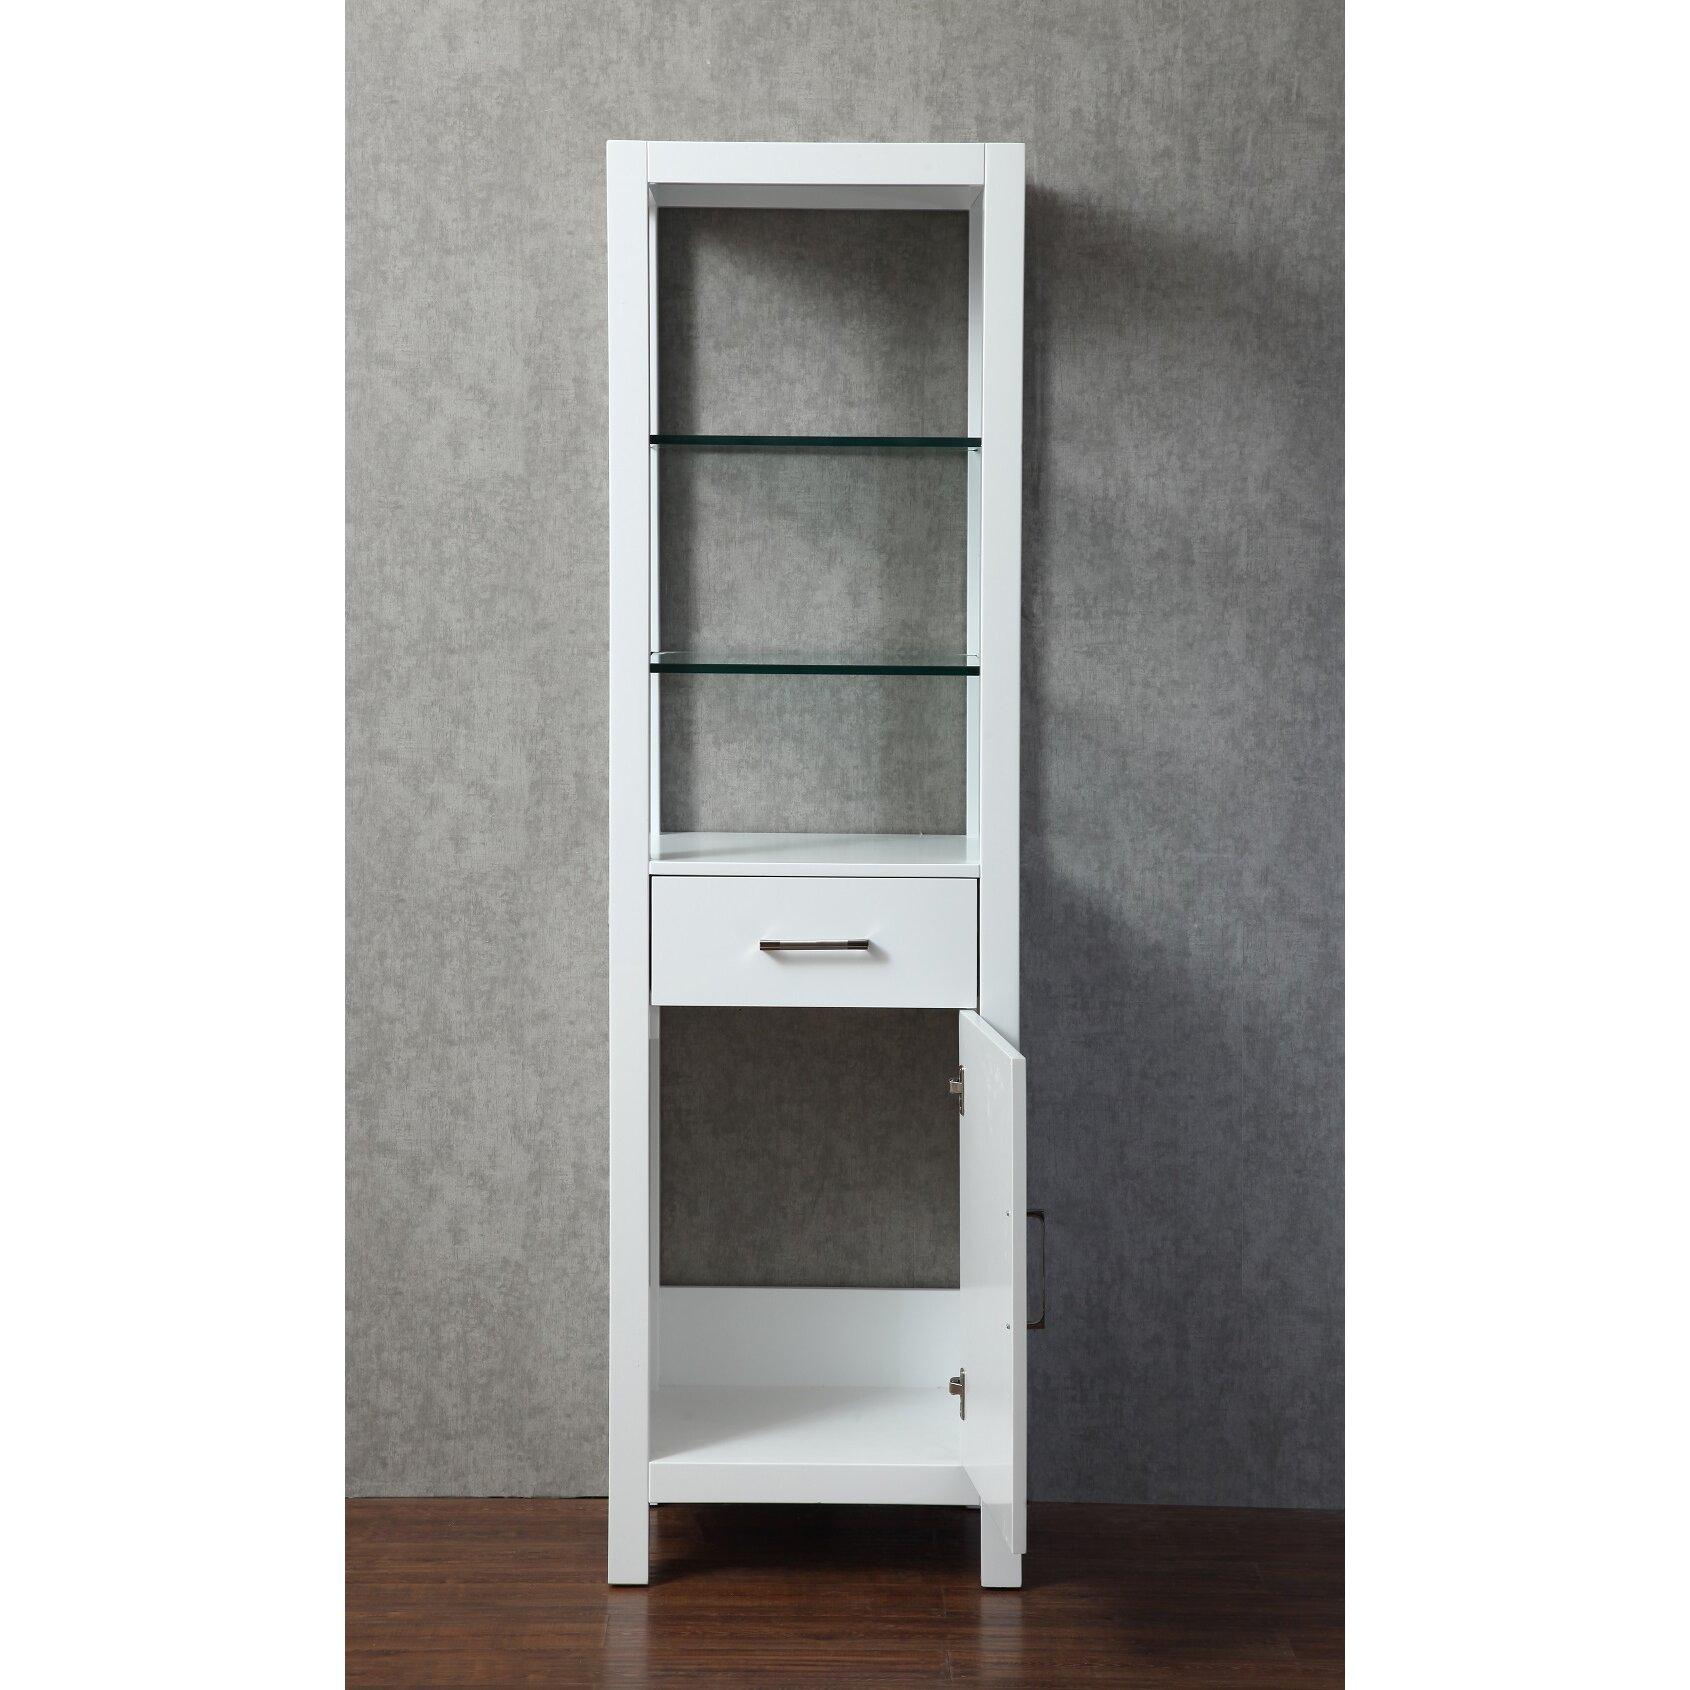 dcor design kenya 20 x 70 free standing linen cabinet